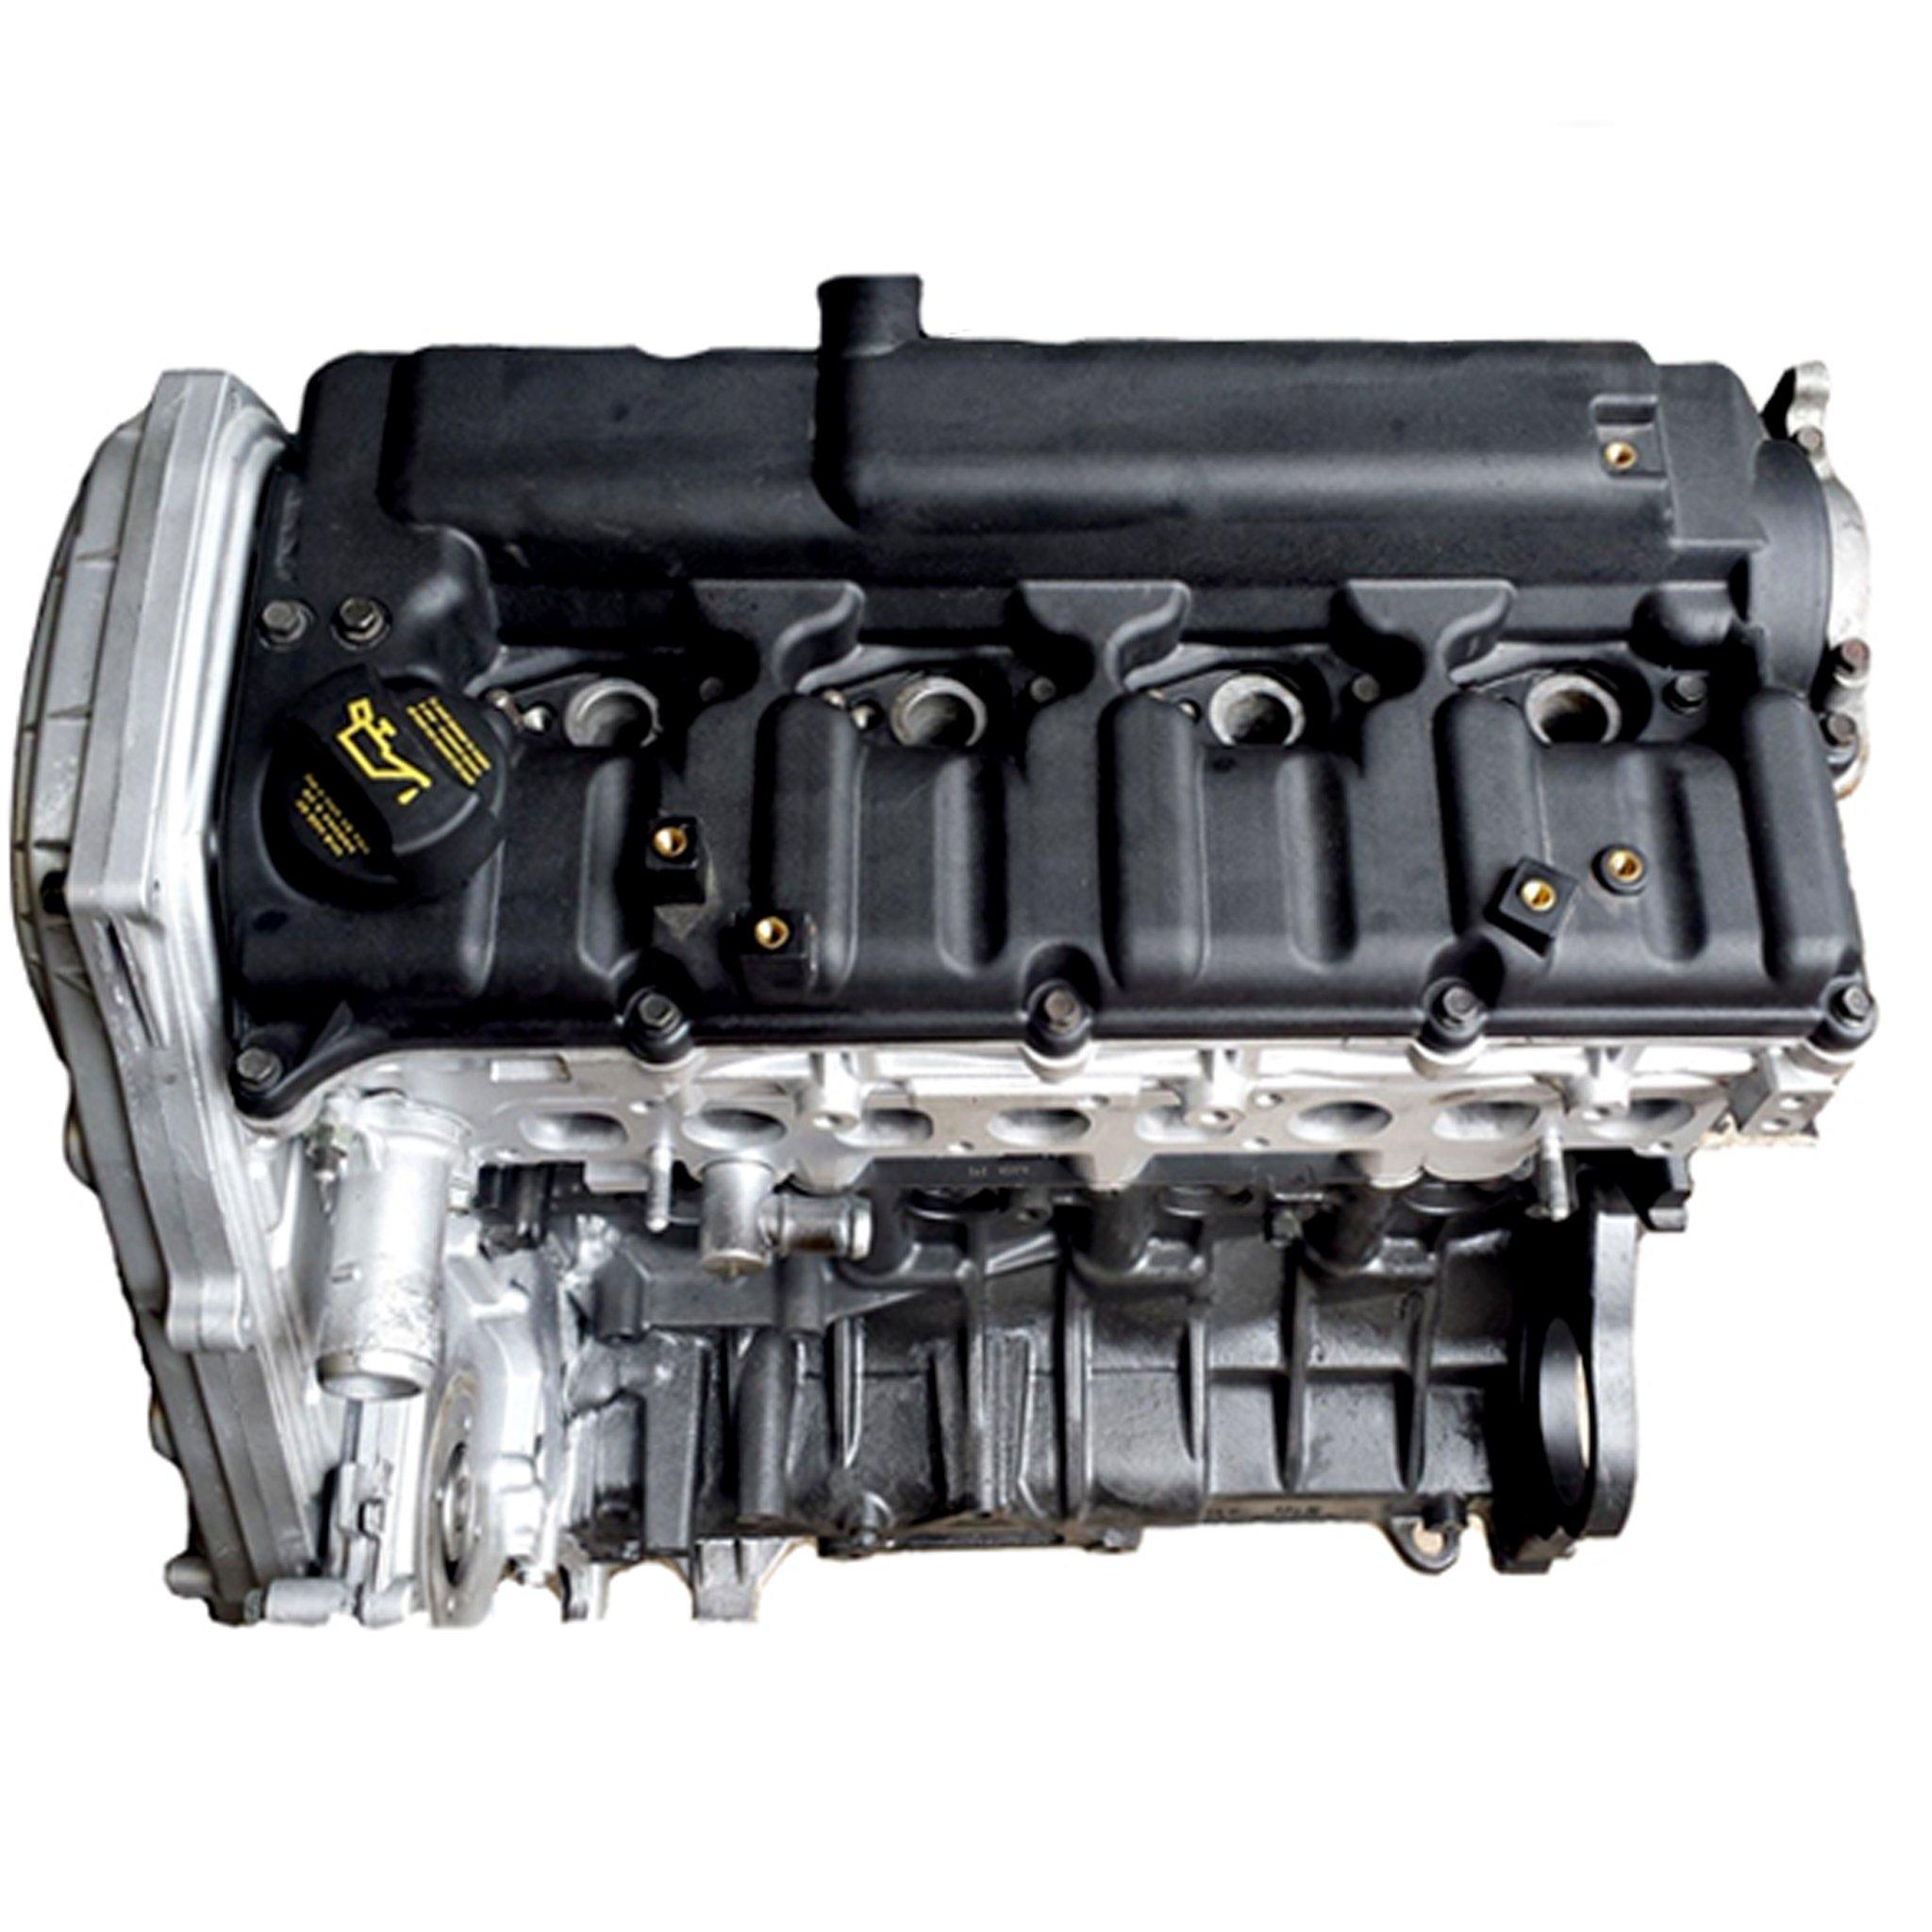 hyundai h1 25 crdi двигатель d4cb 170km engine motor